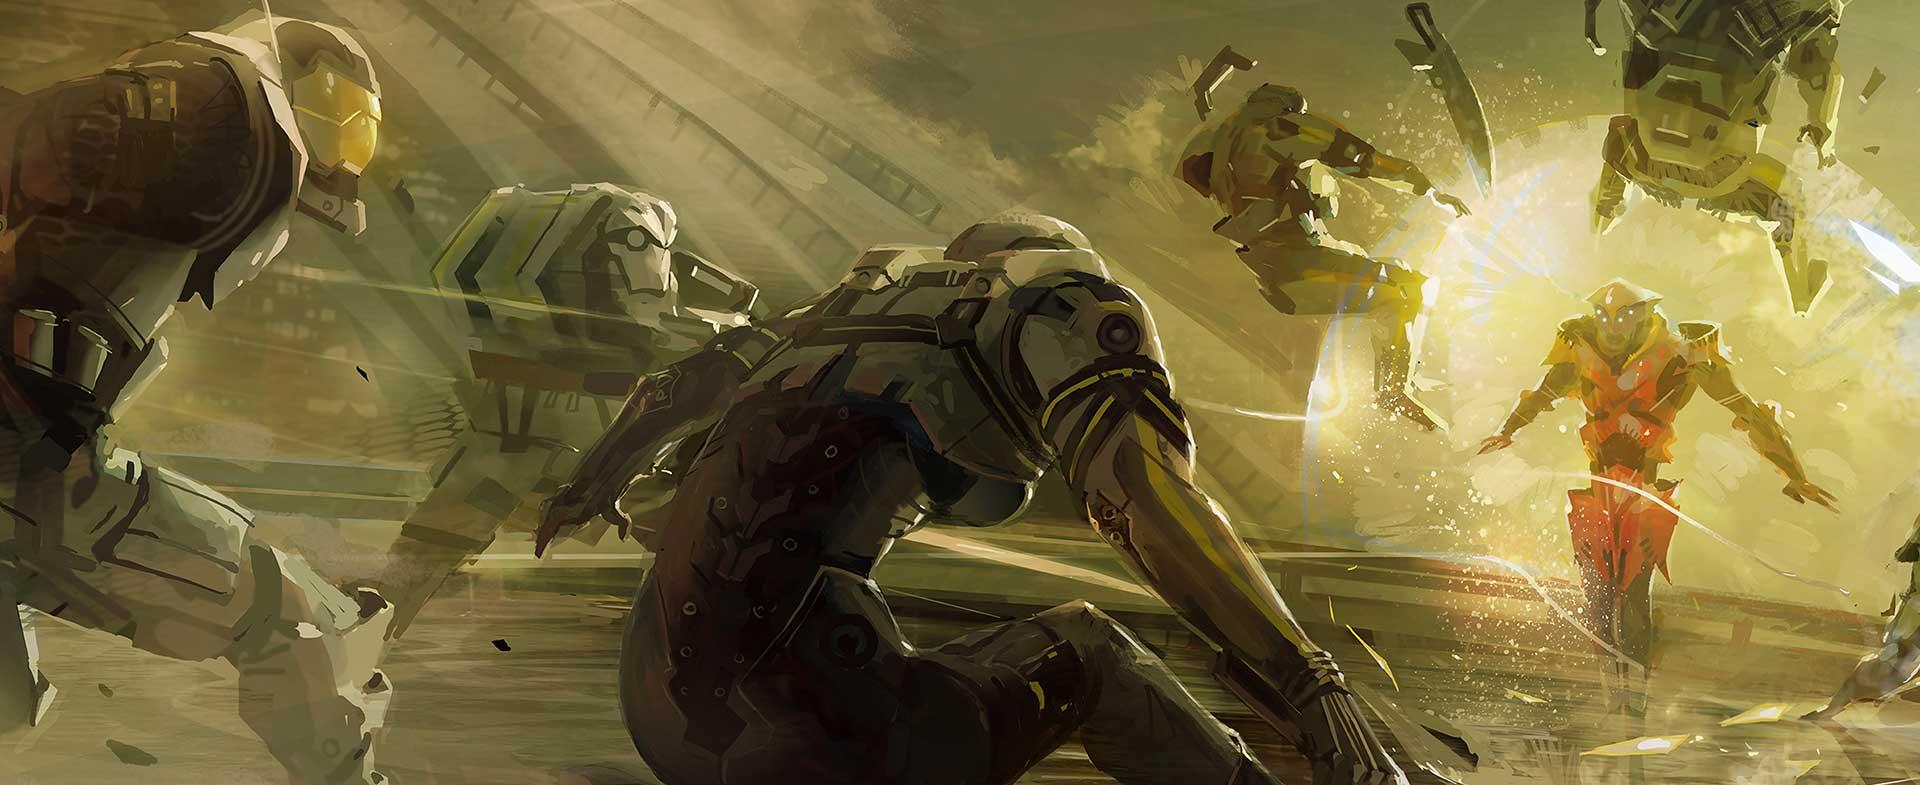 Кряк Для Dragon Age Инквизиция